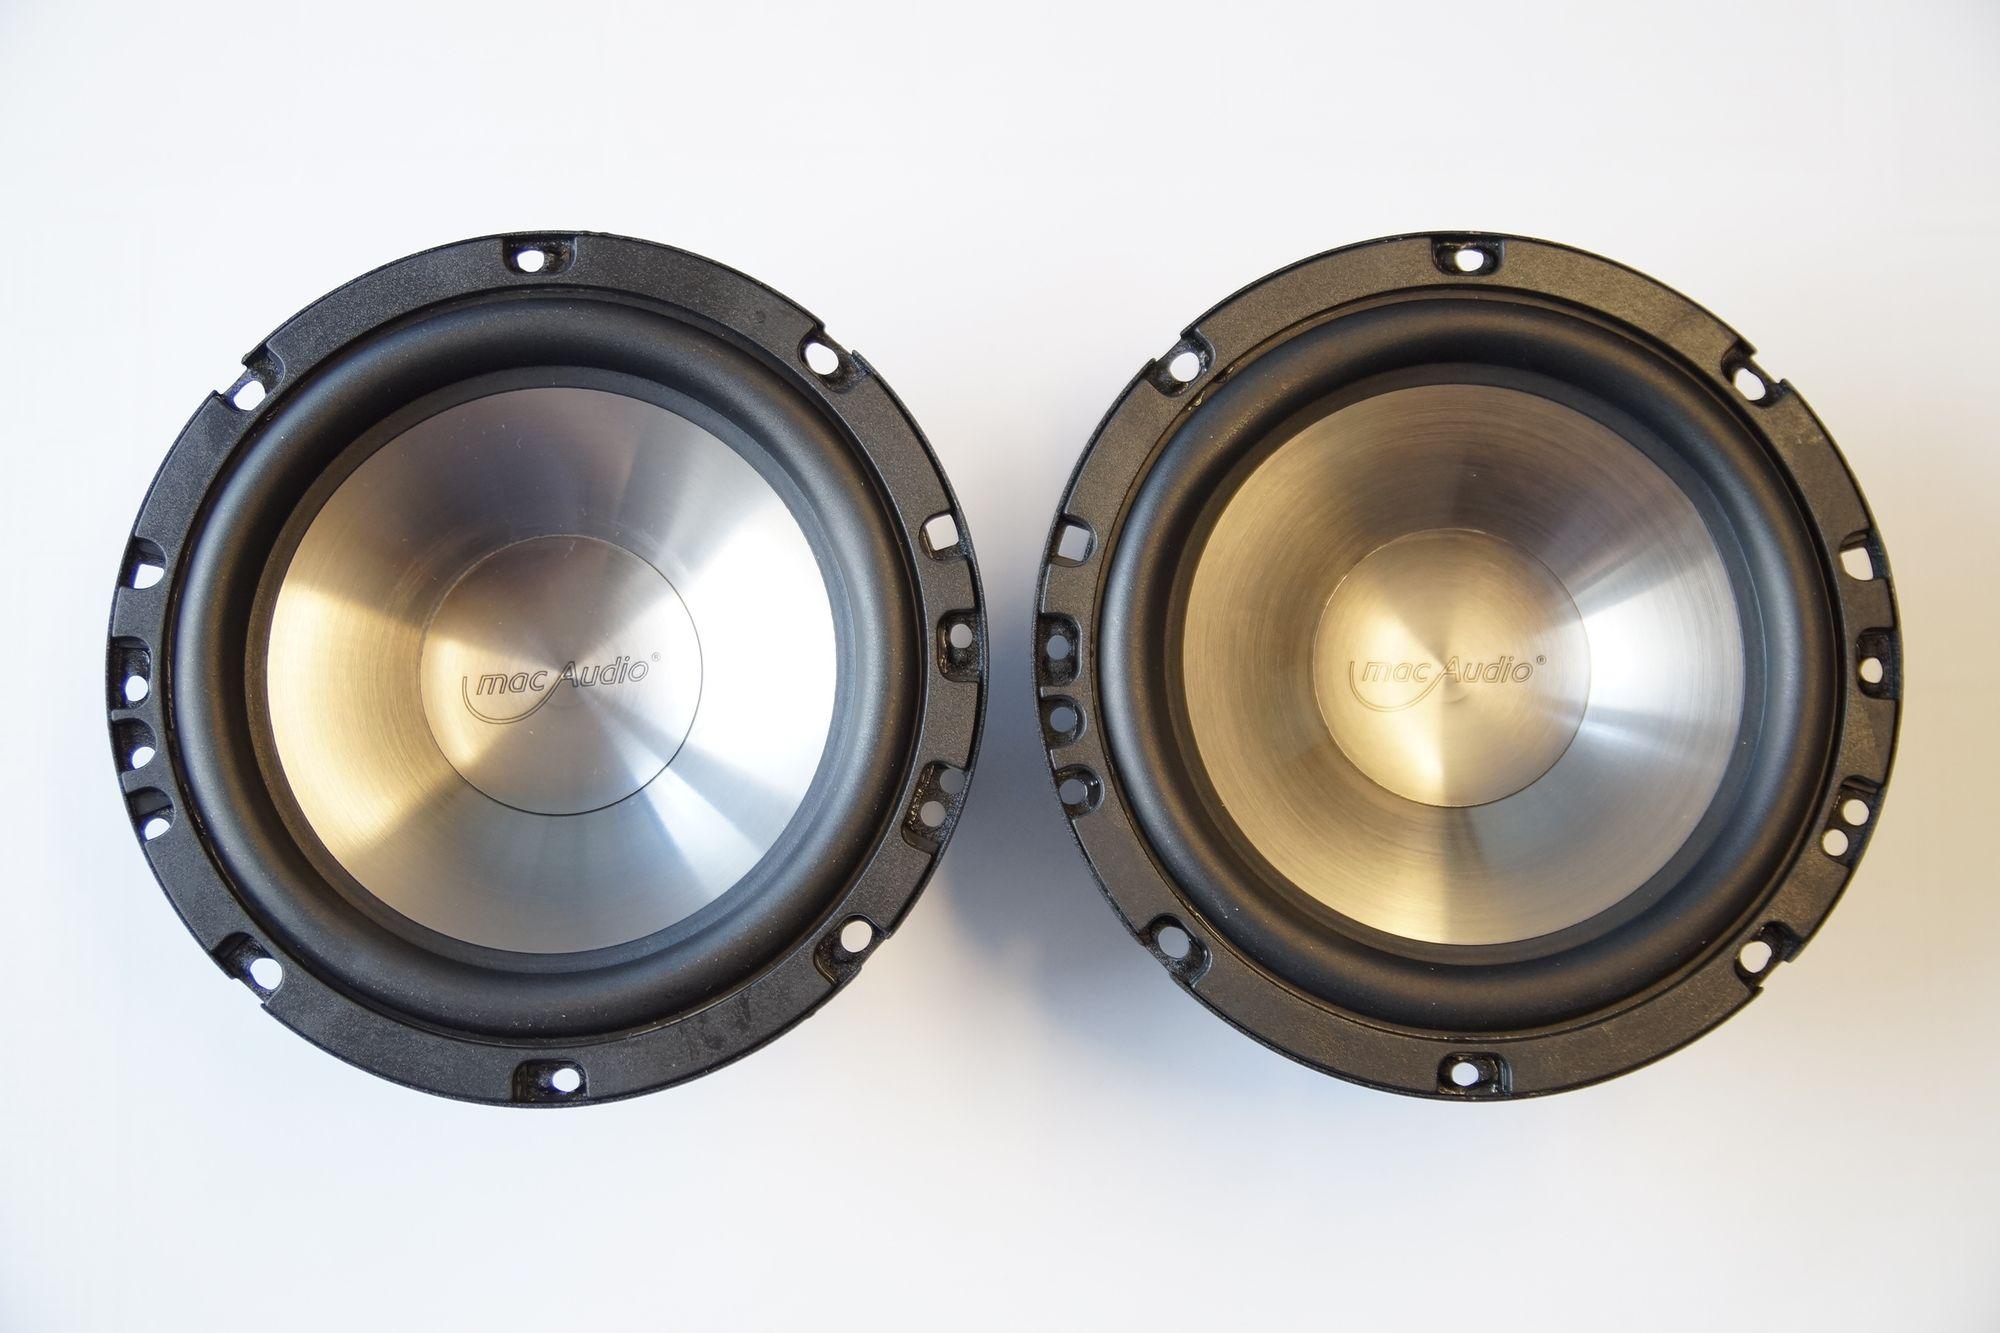 165 mm Kickbass Tiefton Lautsprecher Subwoofer 16 cm mac Audio Audio DVD 2.16